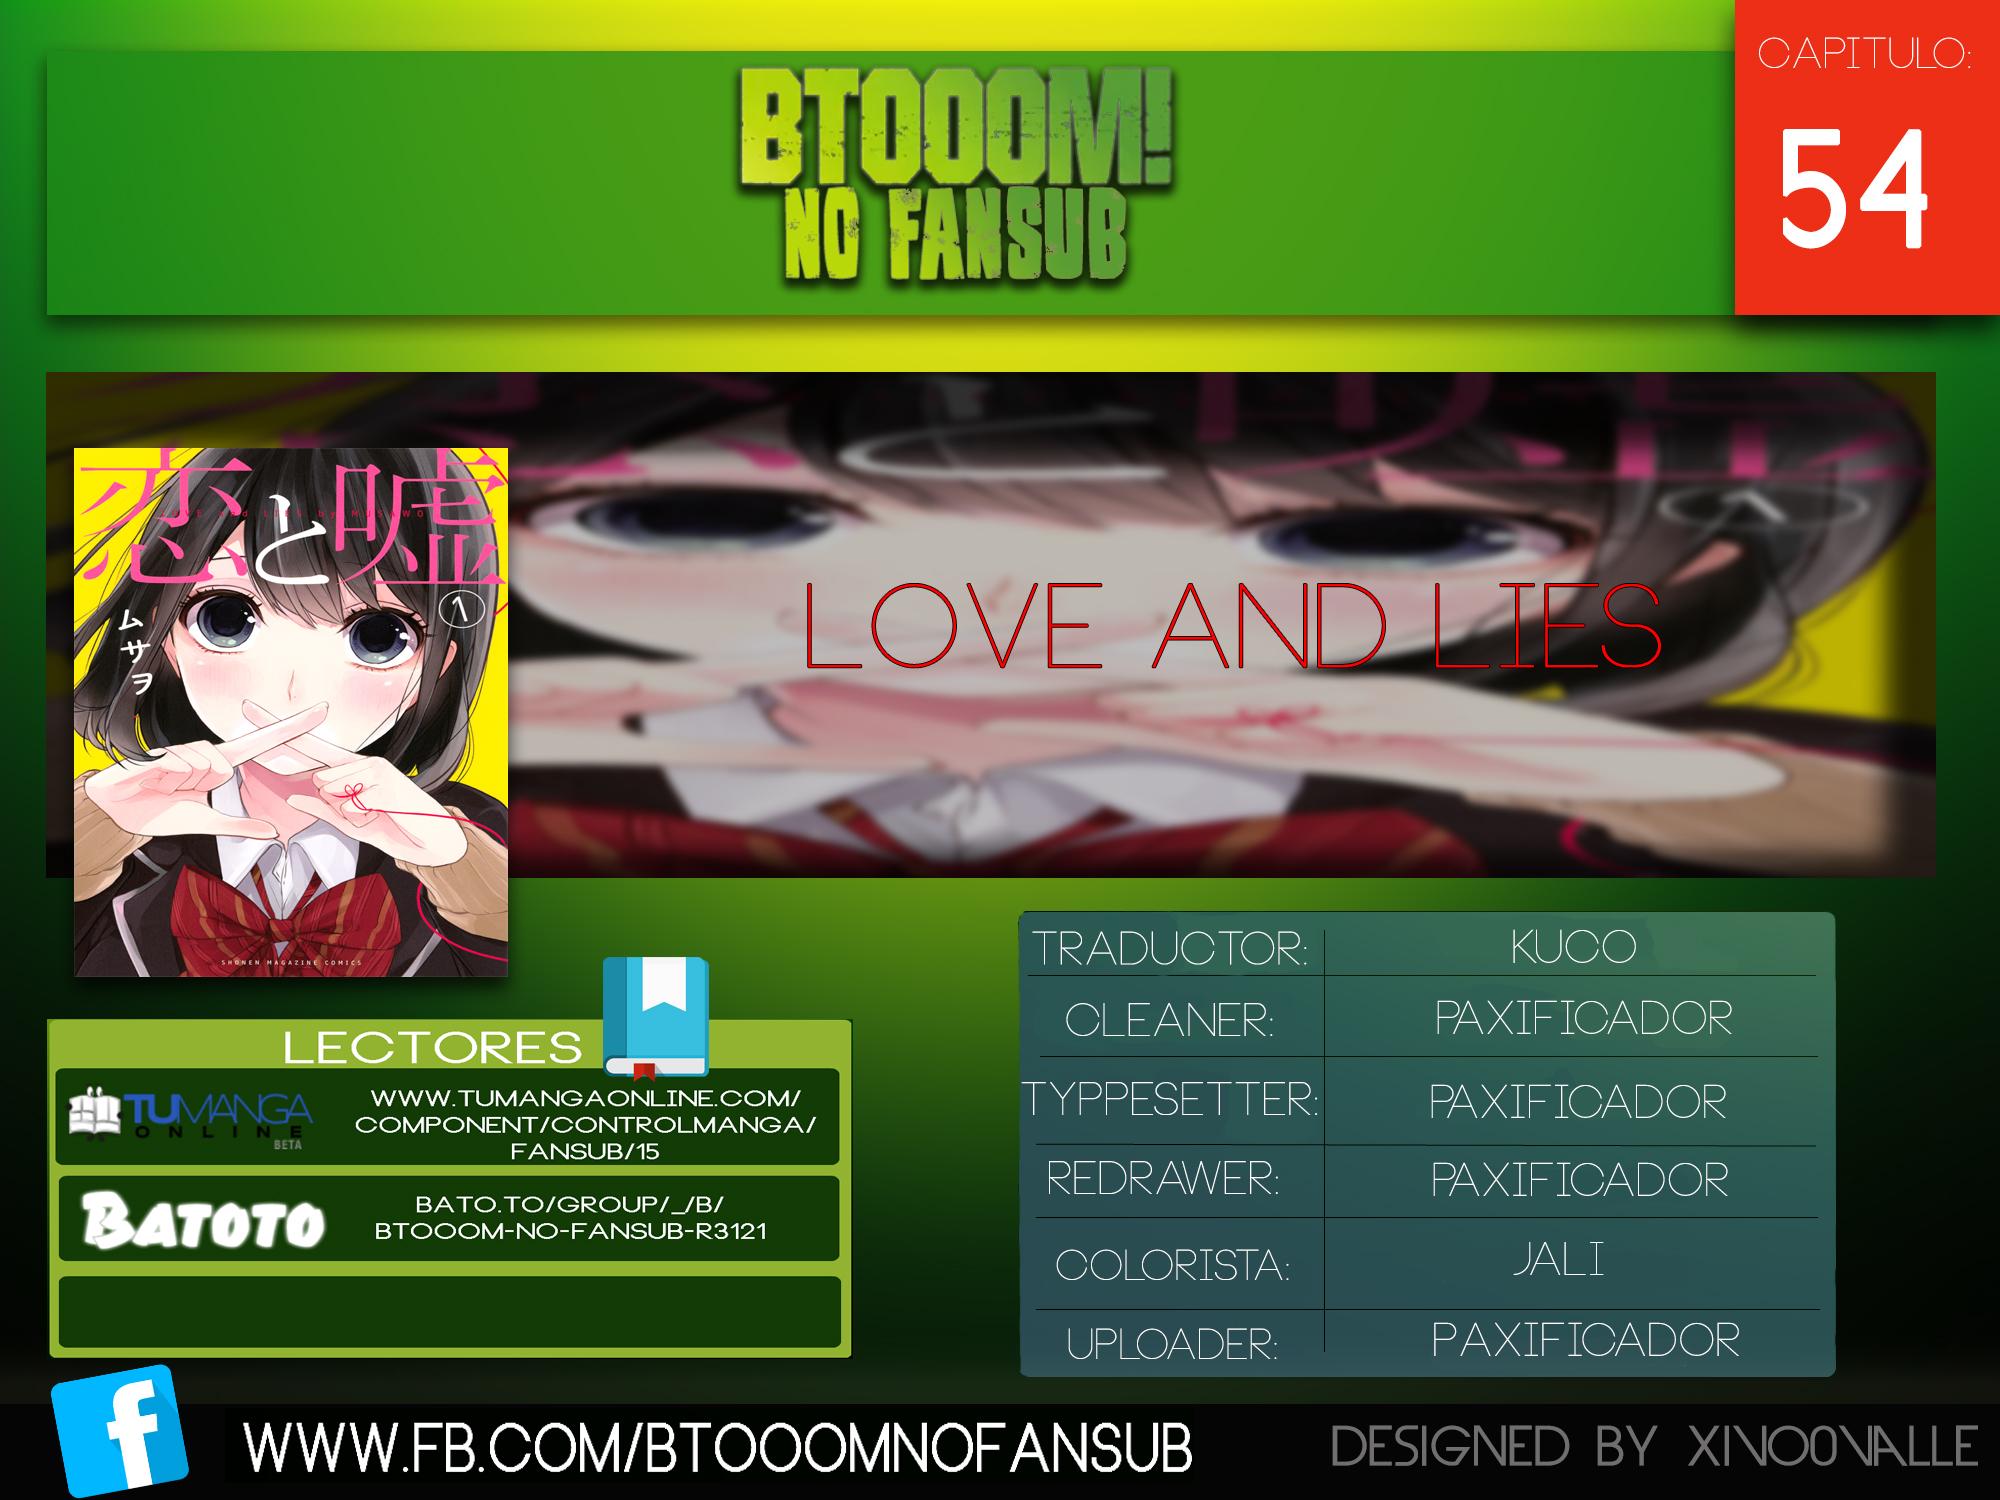 http://c5.ninemanga.com/es_manga/56/16504/417211/299565ce7839e5c99c78fabf8a6af2b8.jpg Page 1